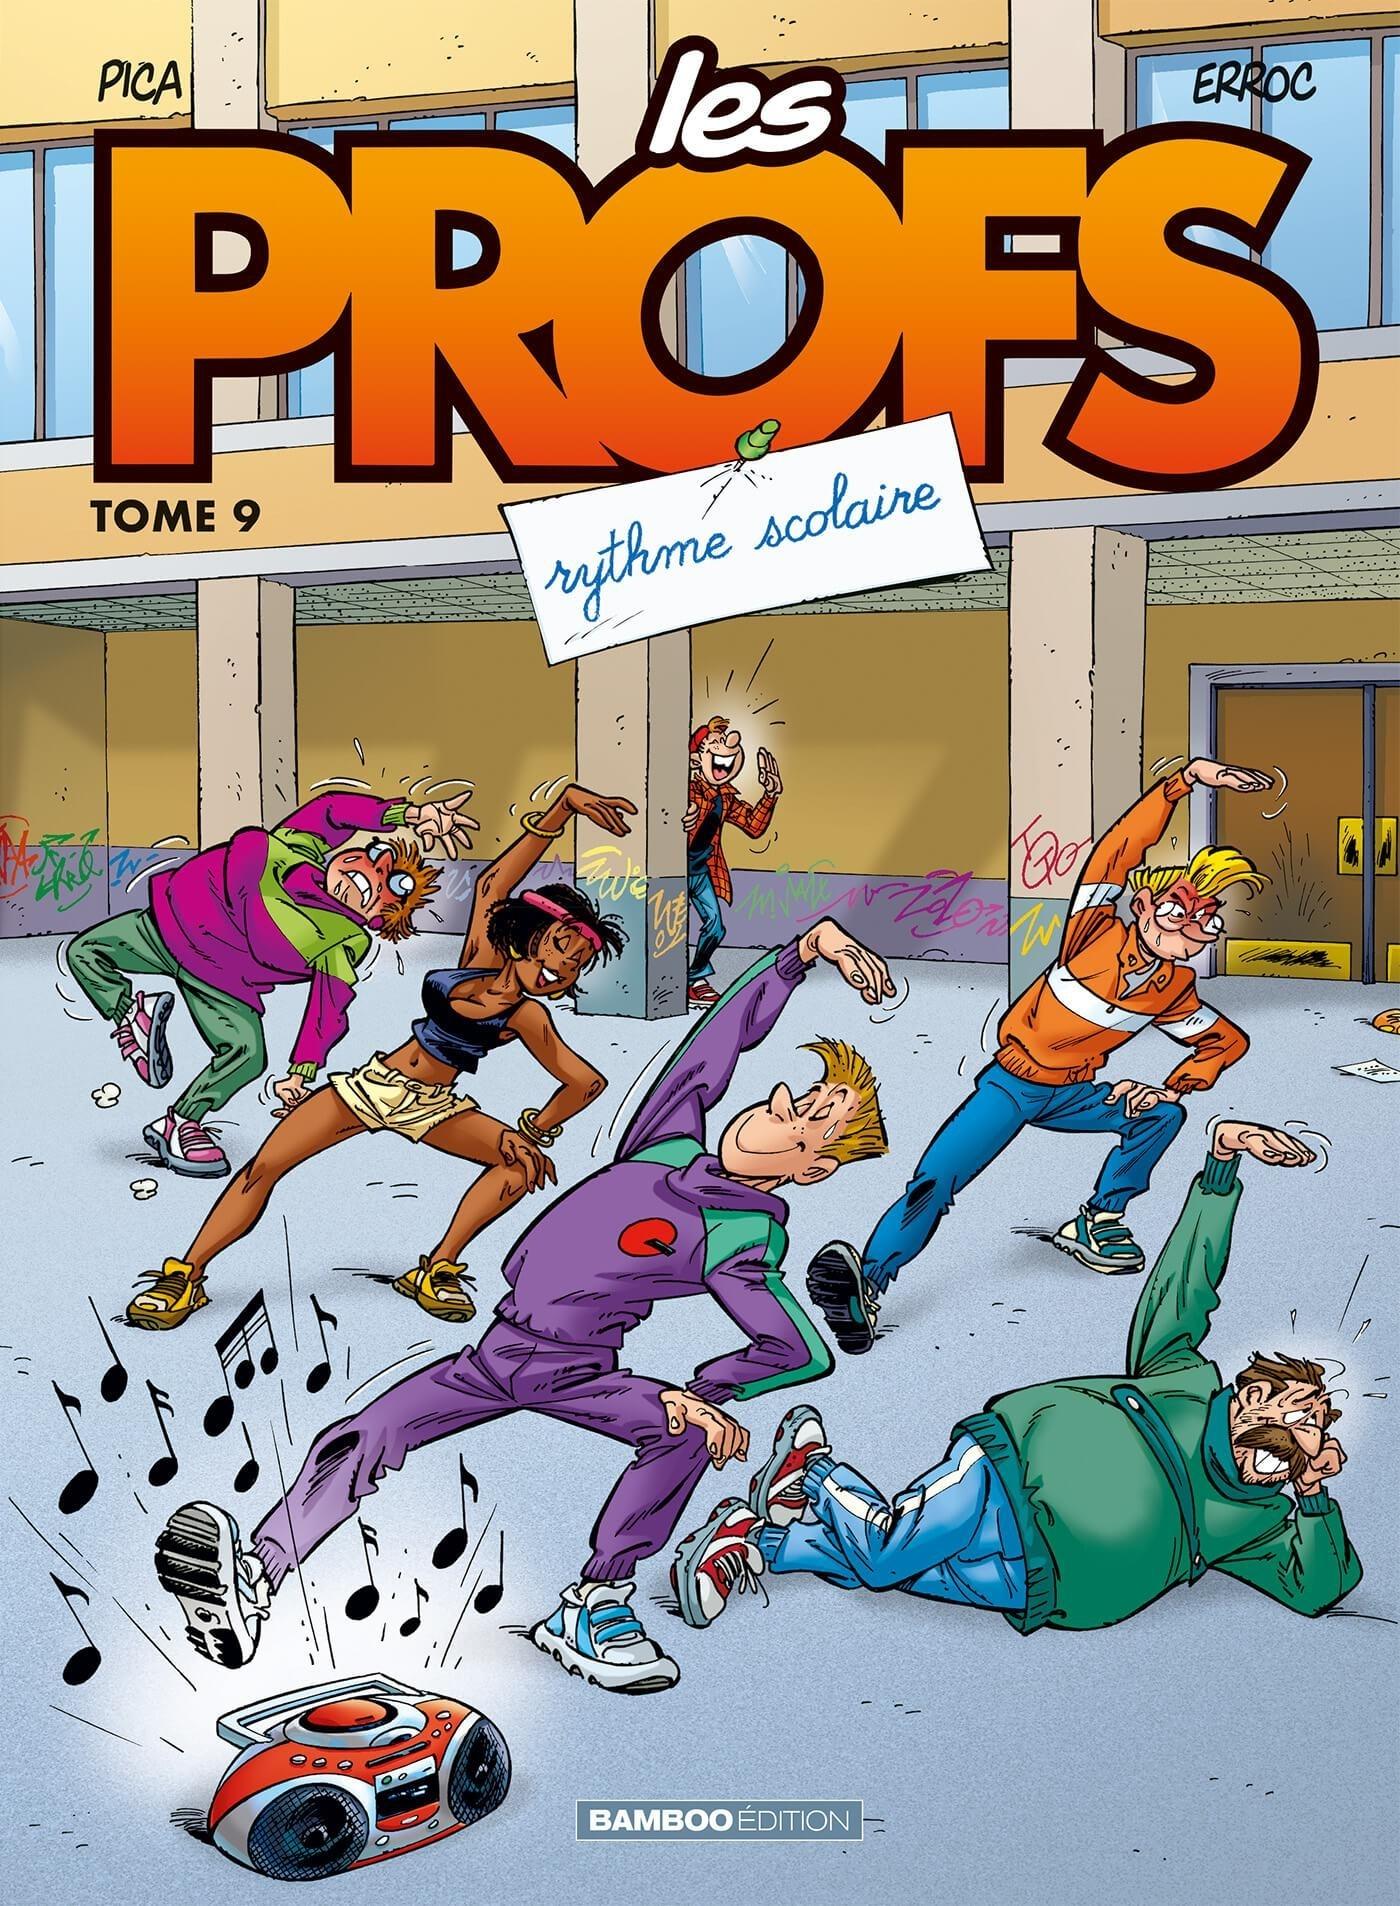 LES PROFS - TOME 9 - RYTHME SCOLAIRE